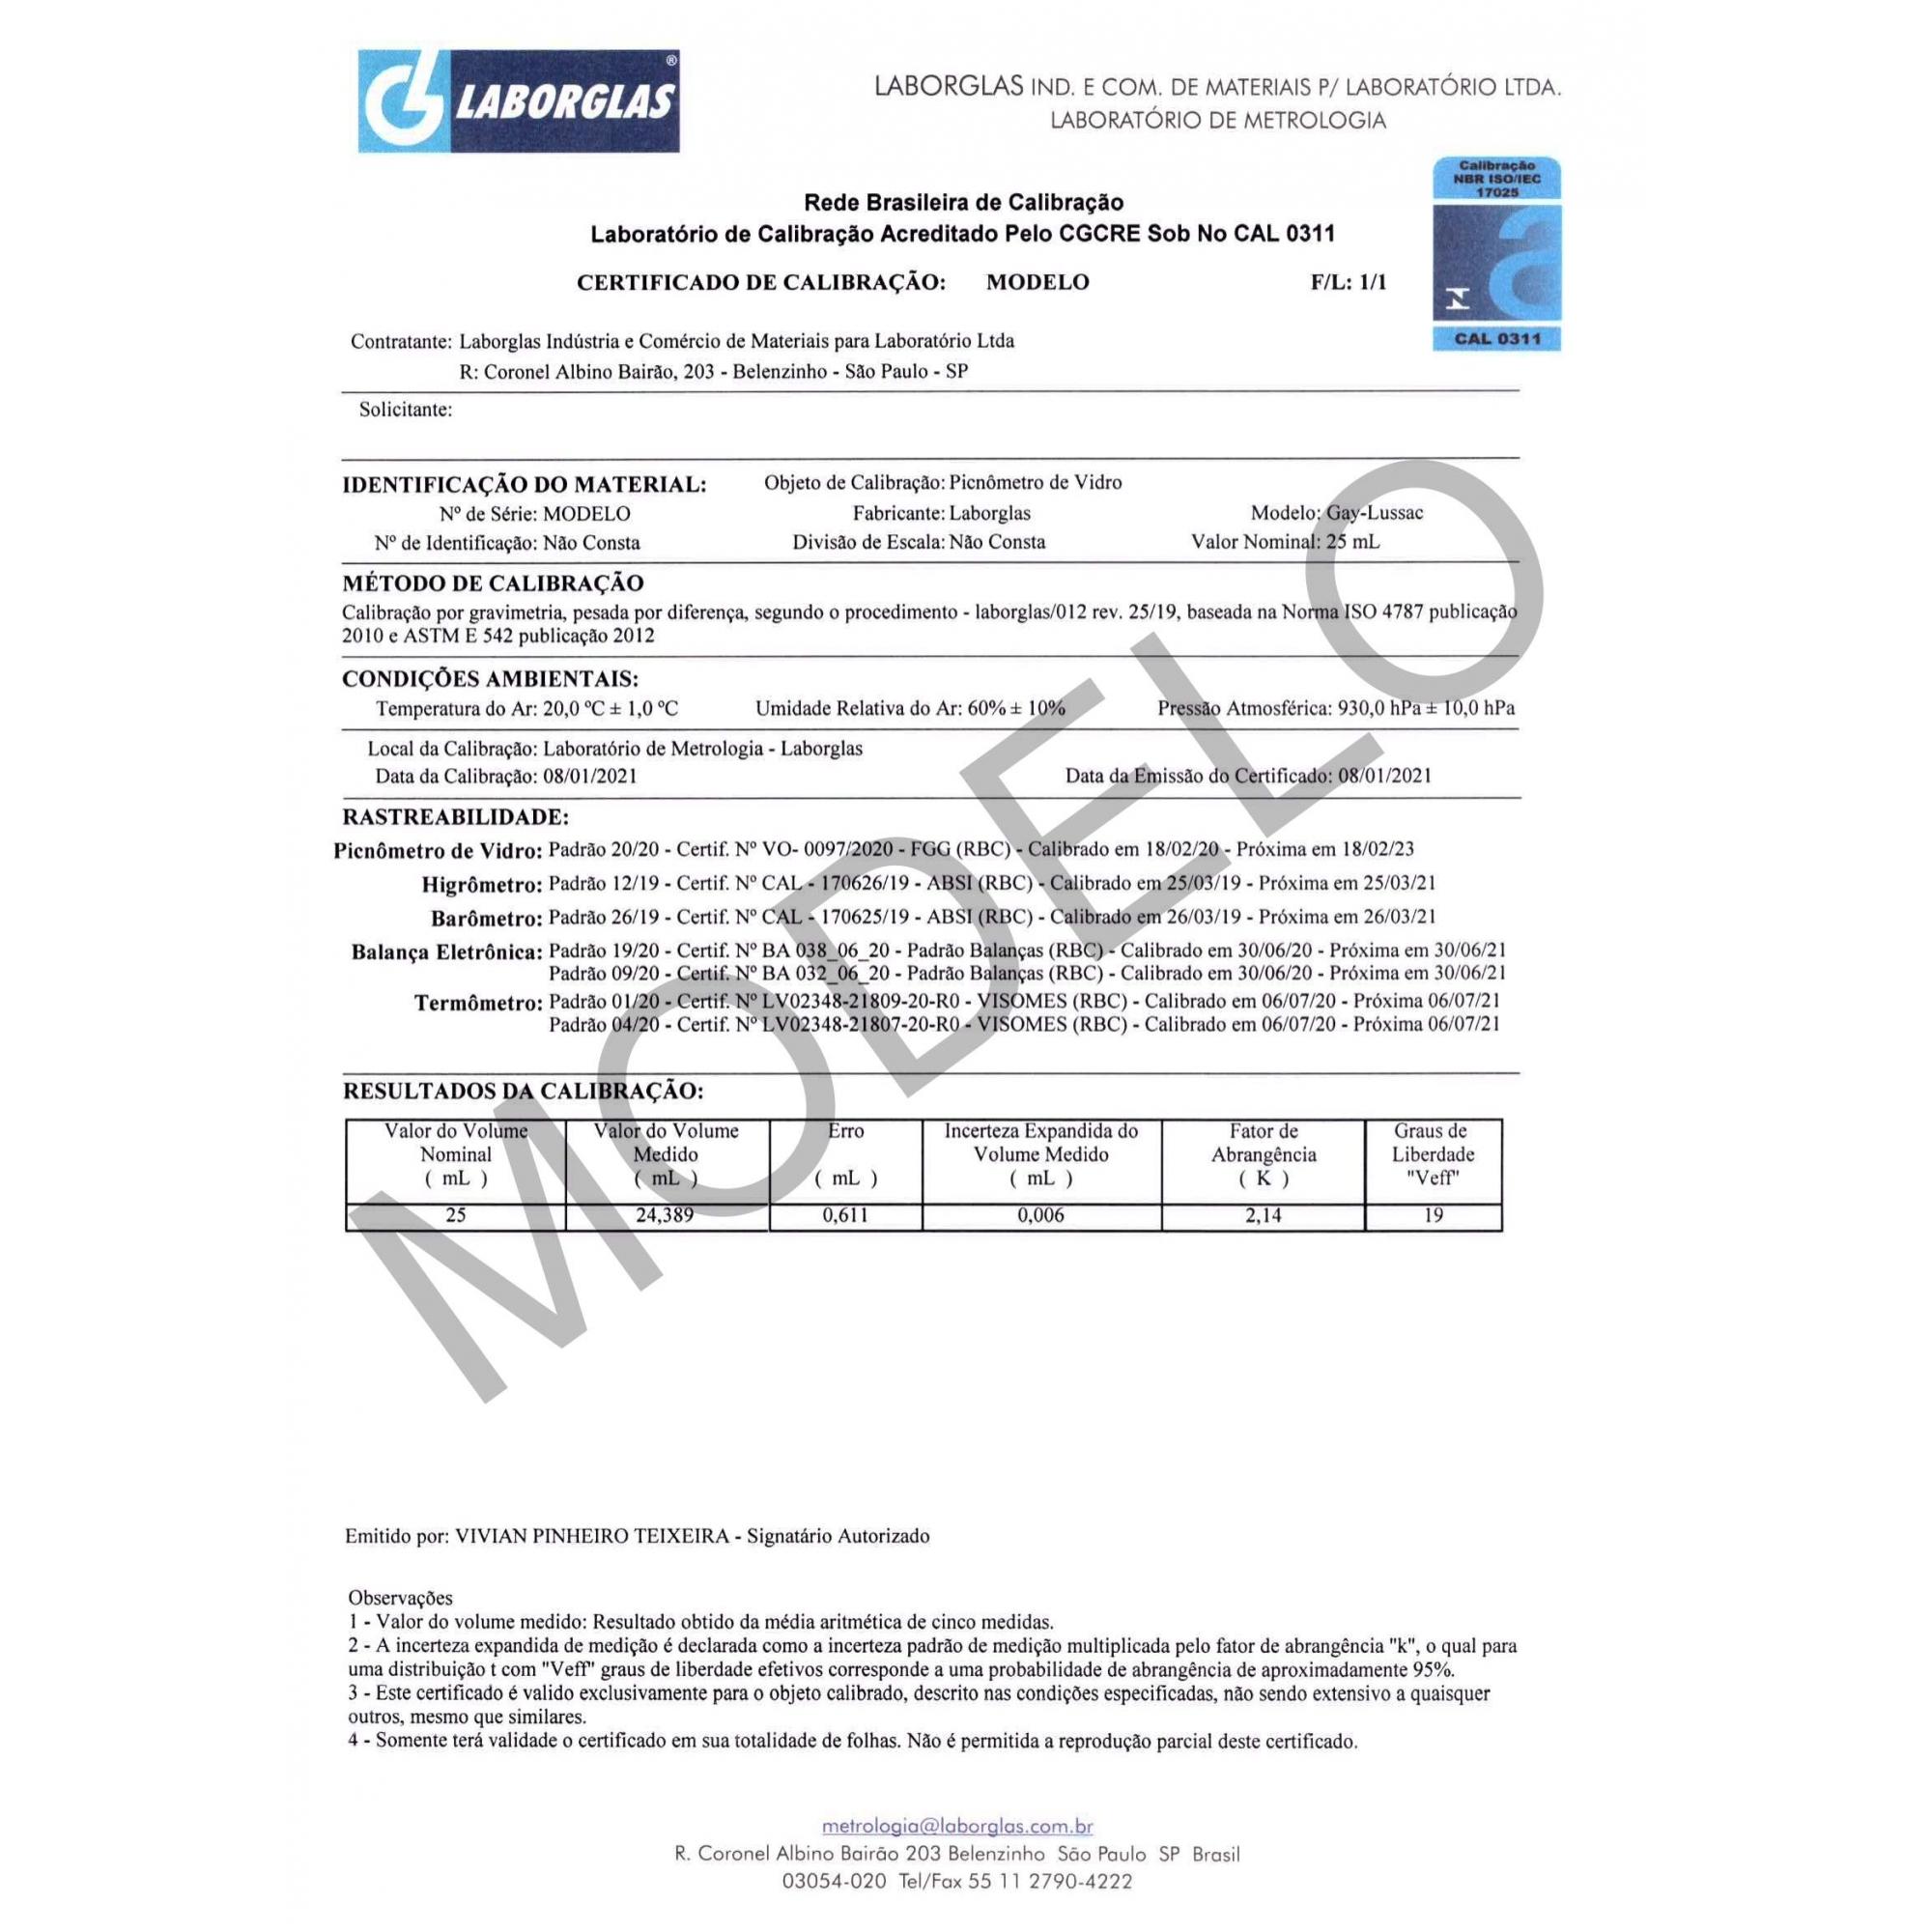 PICNÔMETRO GAY-LUSSAC SEM TERMÔMETRO 500 ML CERTIFICADO RBC - Laborglas - Cód. 9491144-R